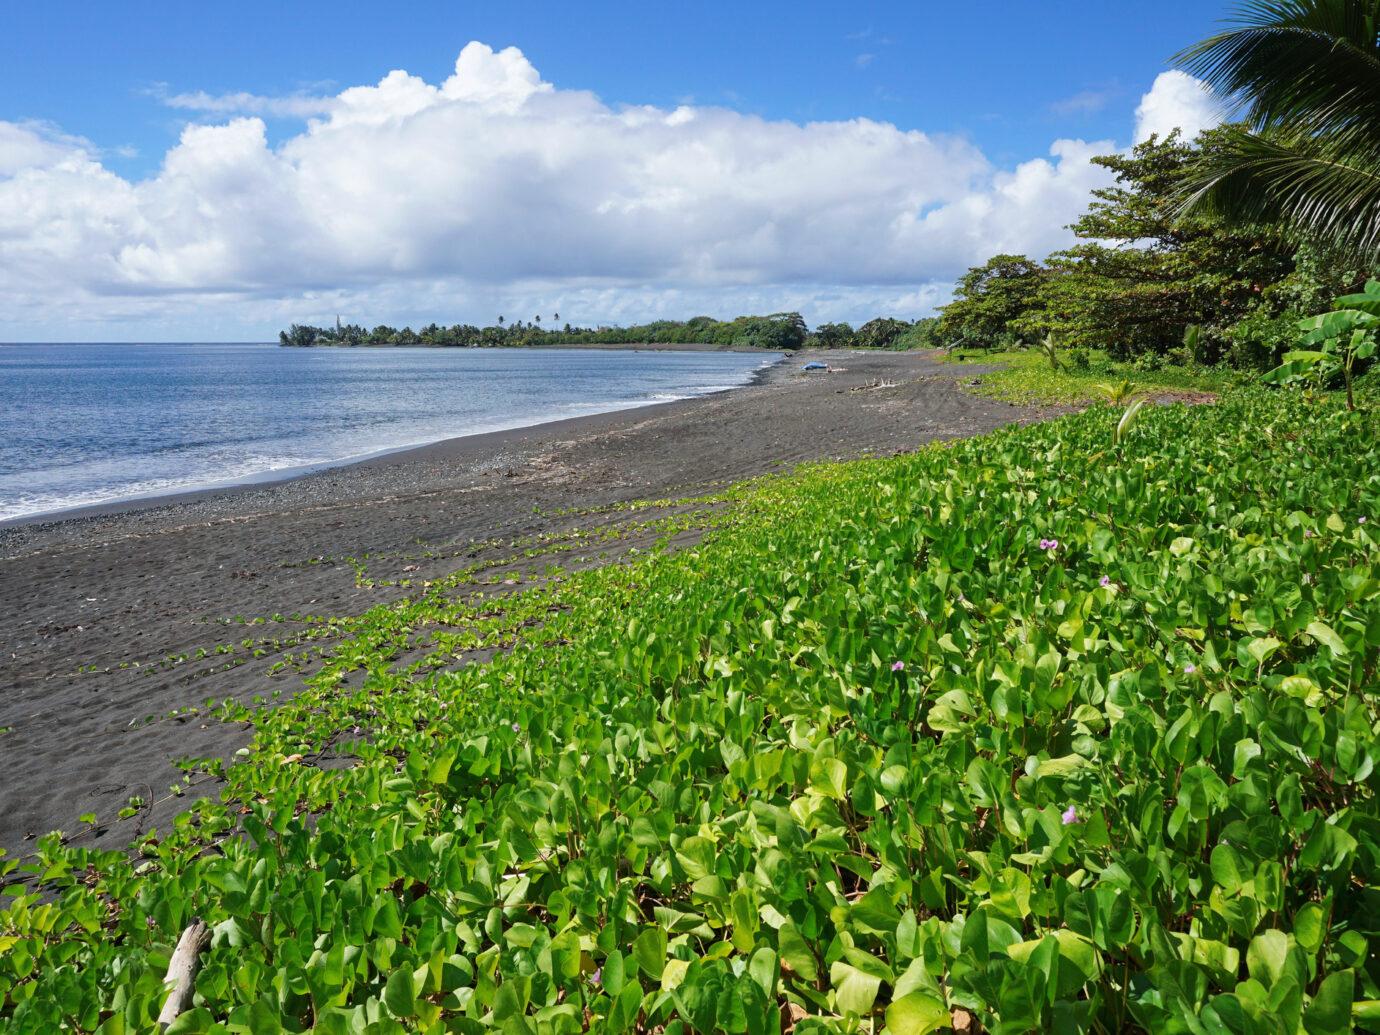 Vegetation (Ipomoea pes-caprae) on a black sand beach of Tahiti island near Tautira village, French Polynesia, south Pacific ocean